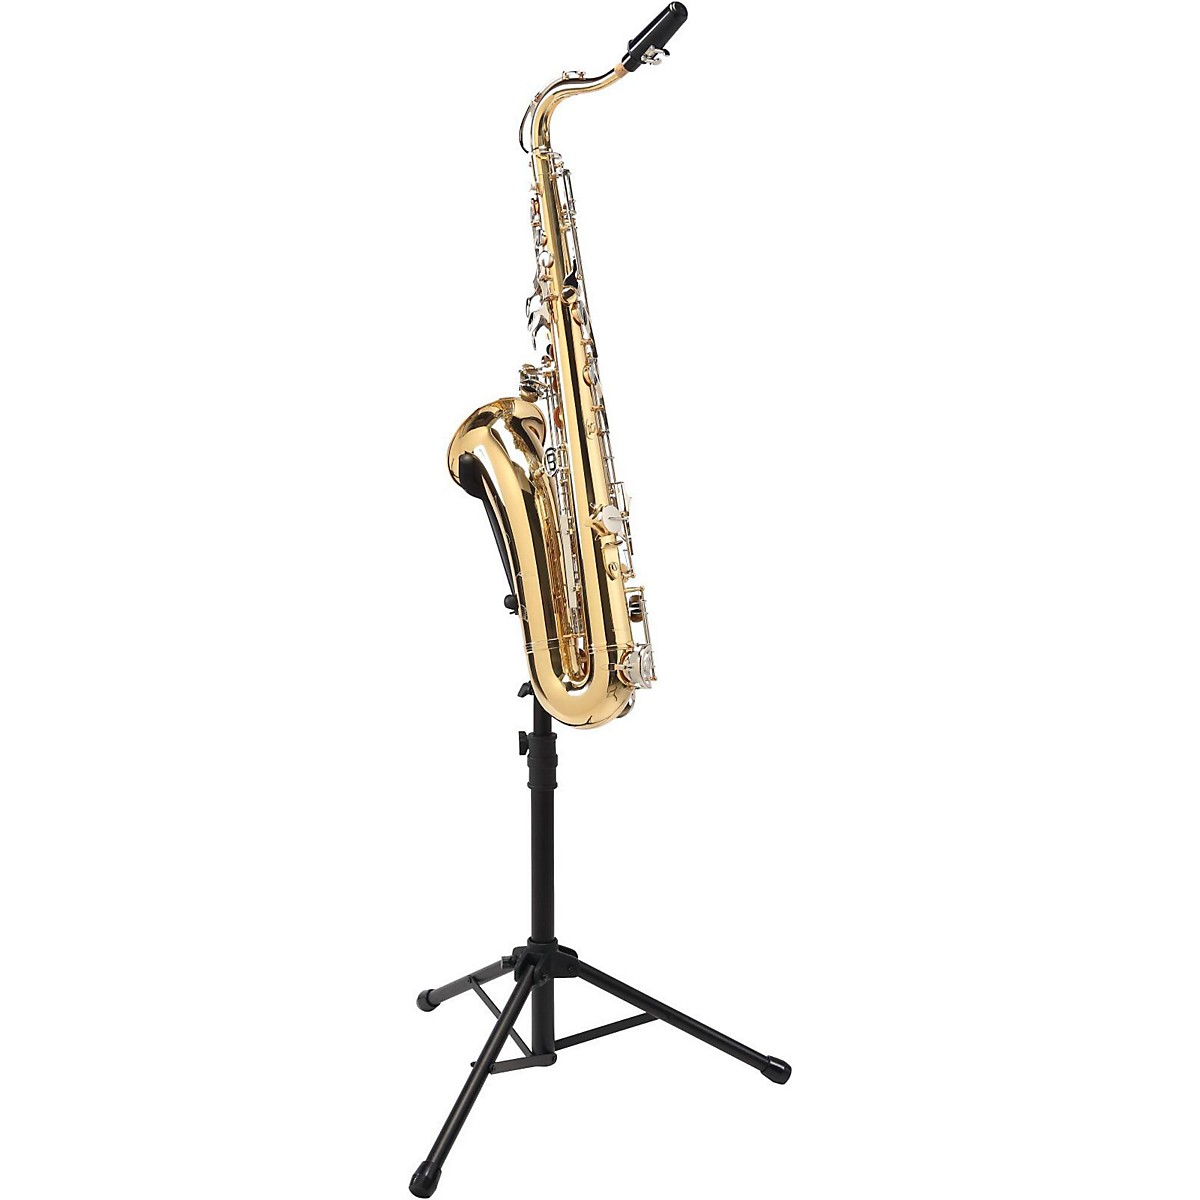 Titan Folding Alto or Tenor Saxophone Tall Standing Stand